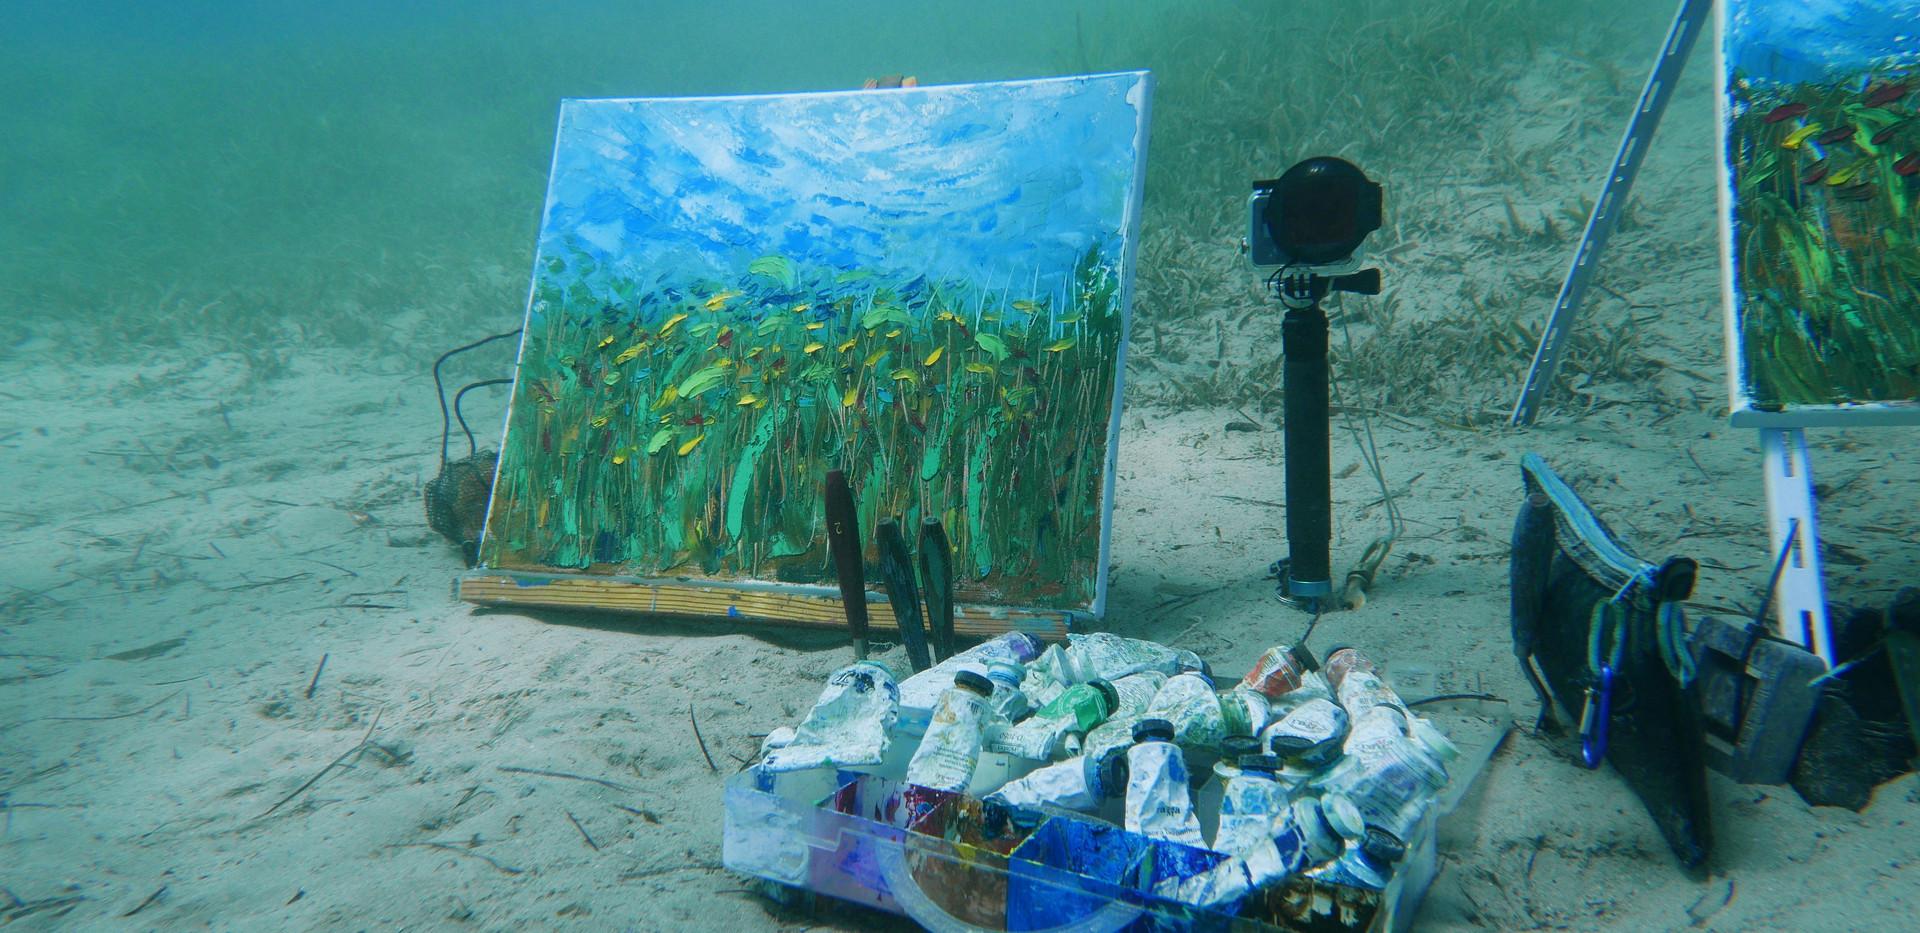 Underwater painting school by Olga Nikitina